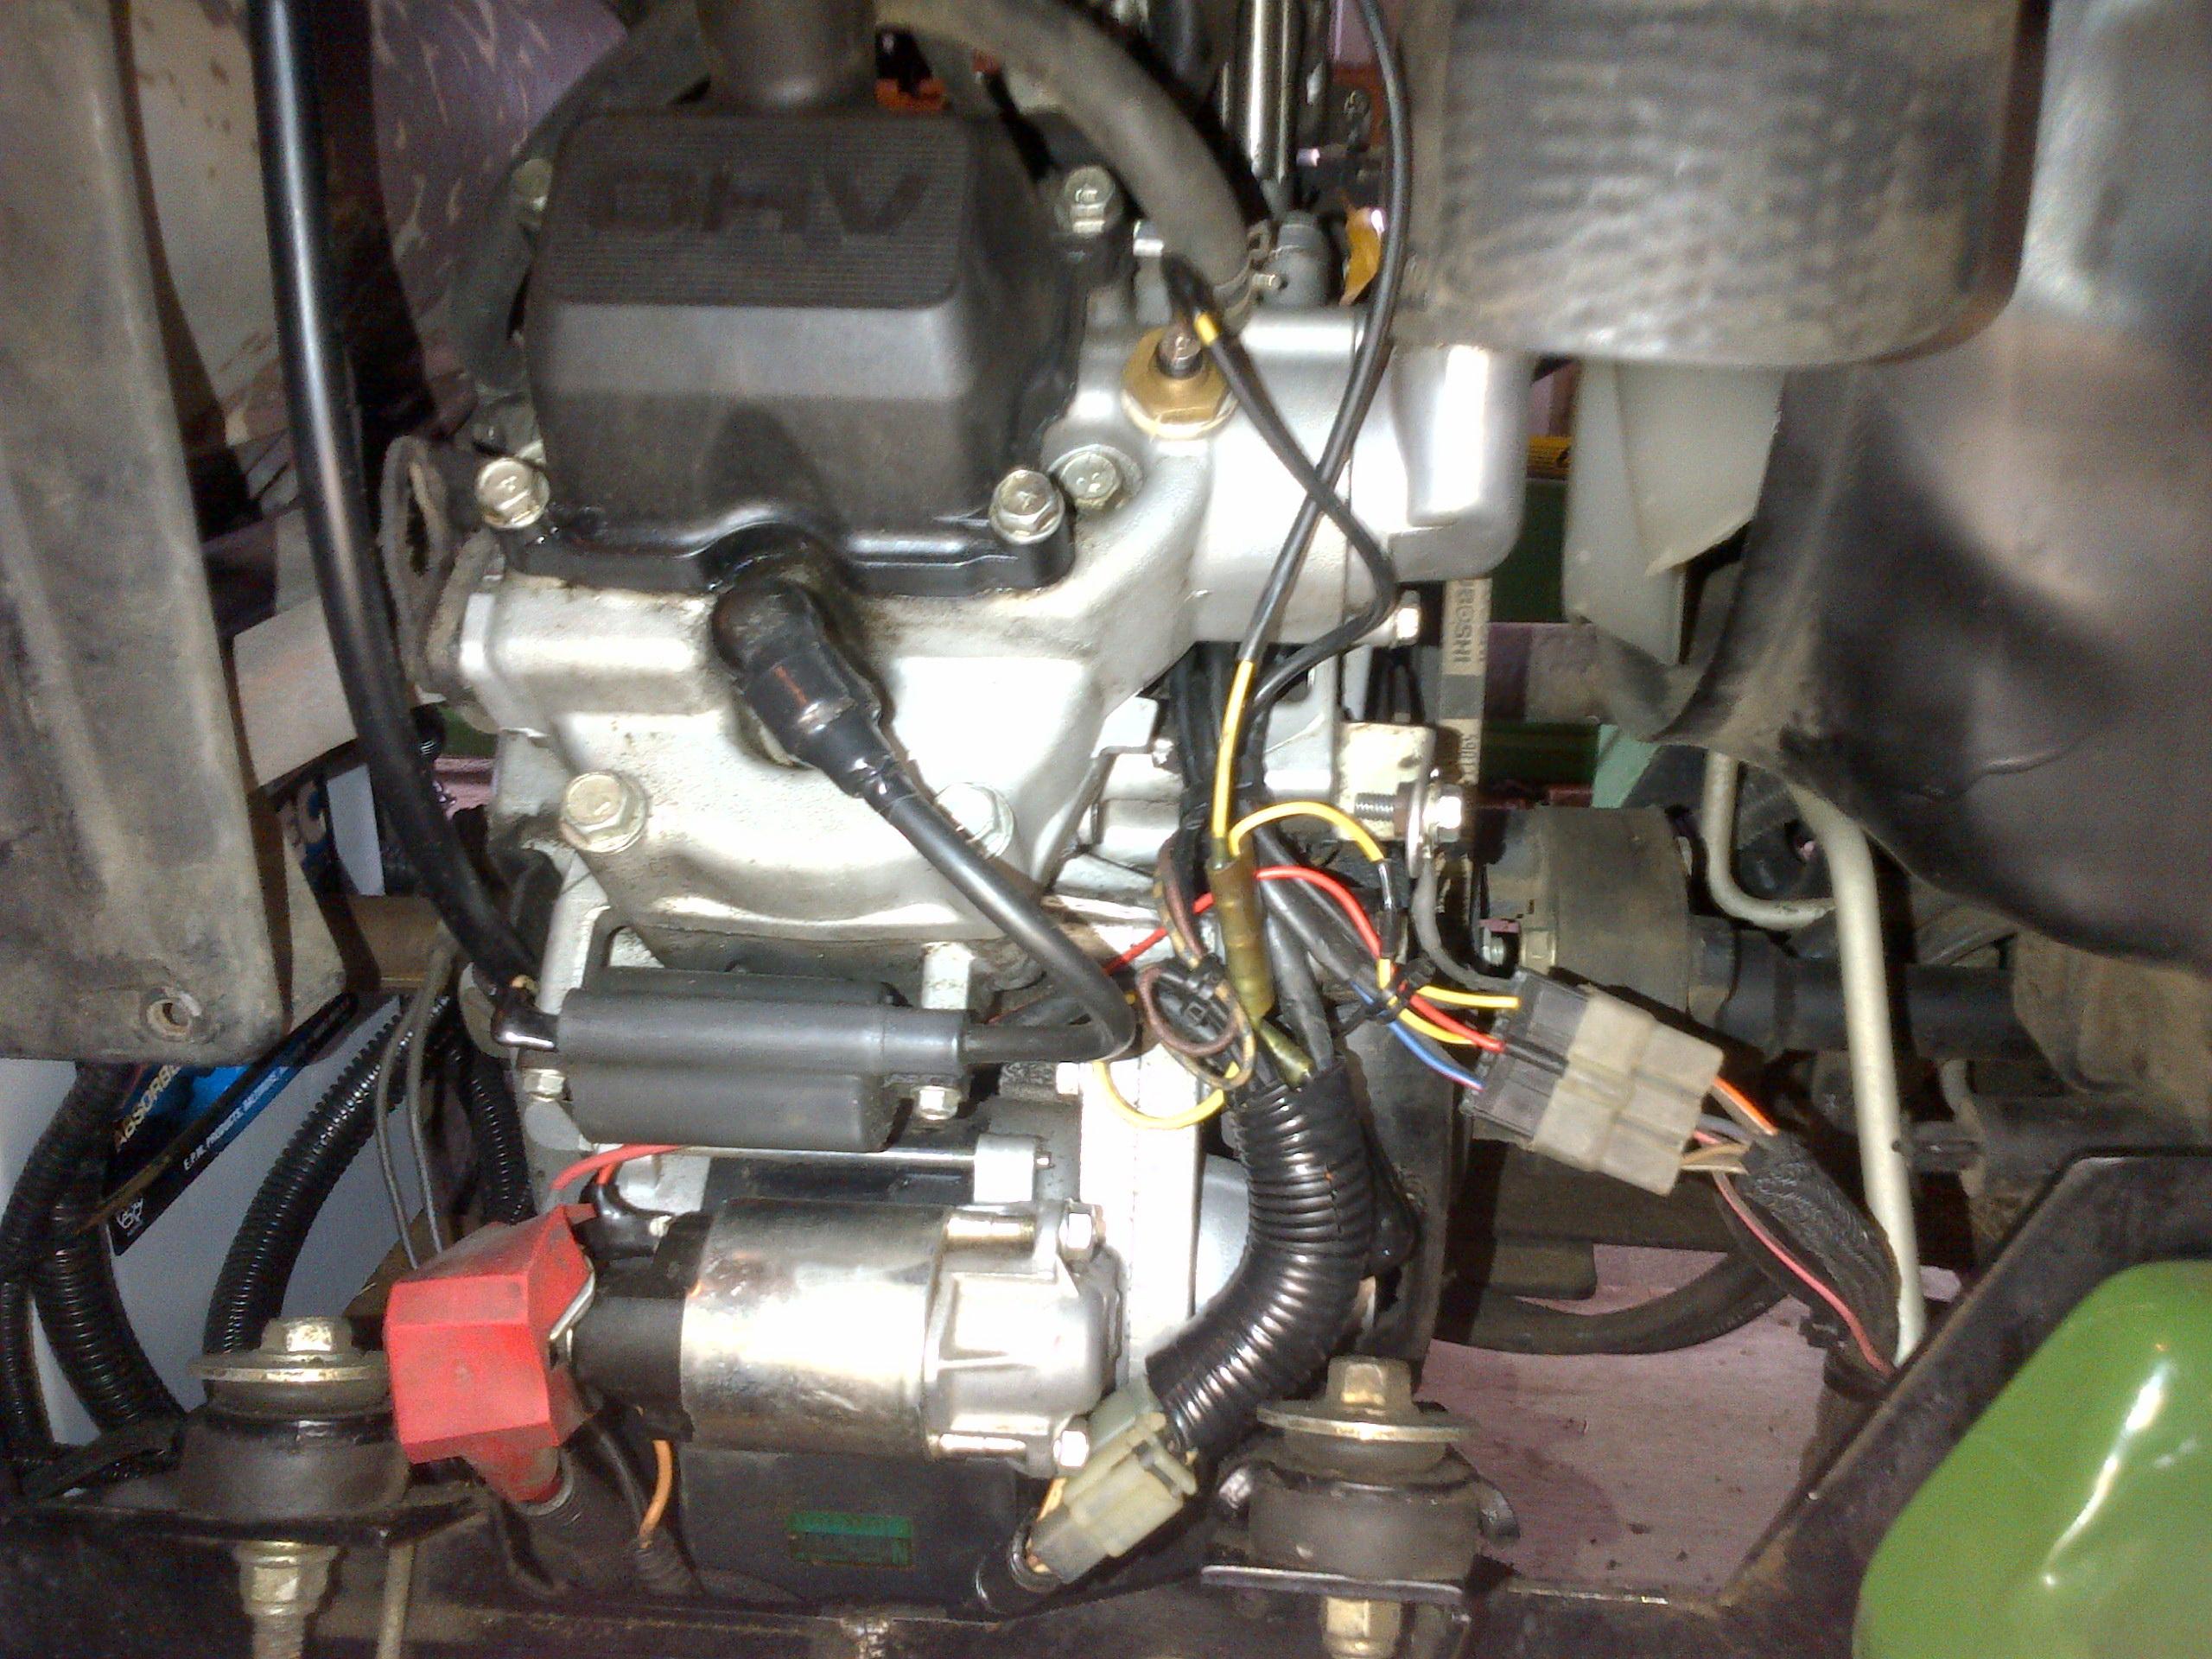 Deere 425 Ignition Module Ground - Page 2 - MyTractorForum